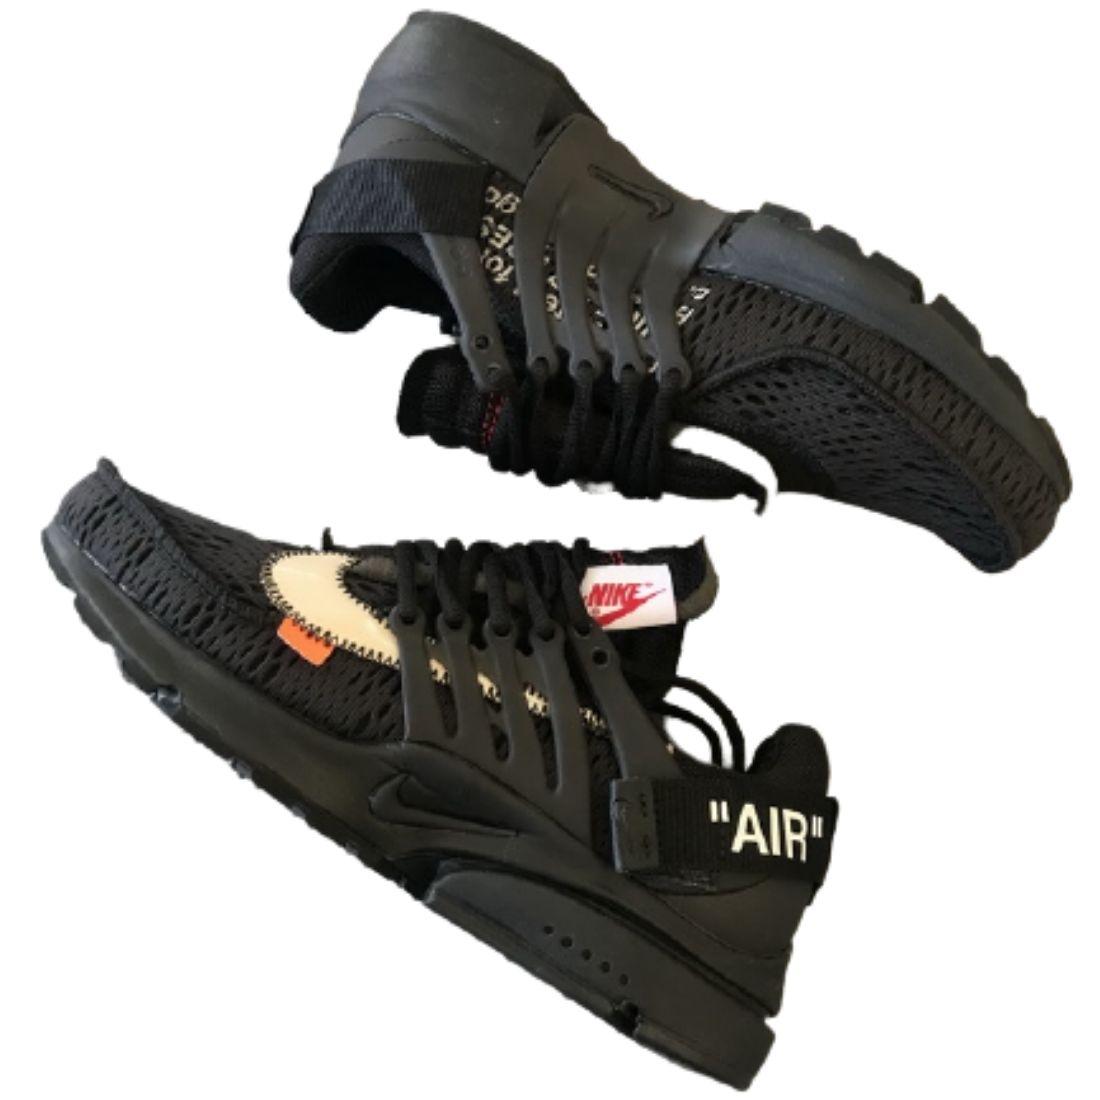 OWF Batch Sneaker & Nike Air Presto Off-White Black (2018) AA3830-002